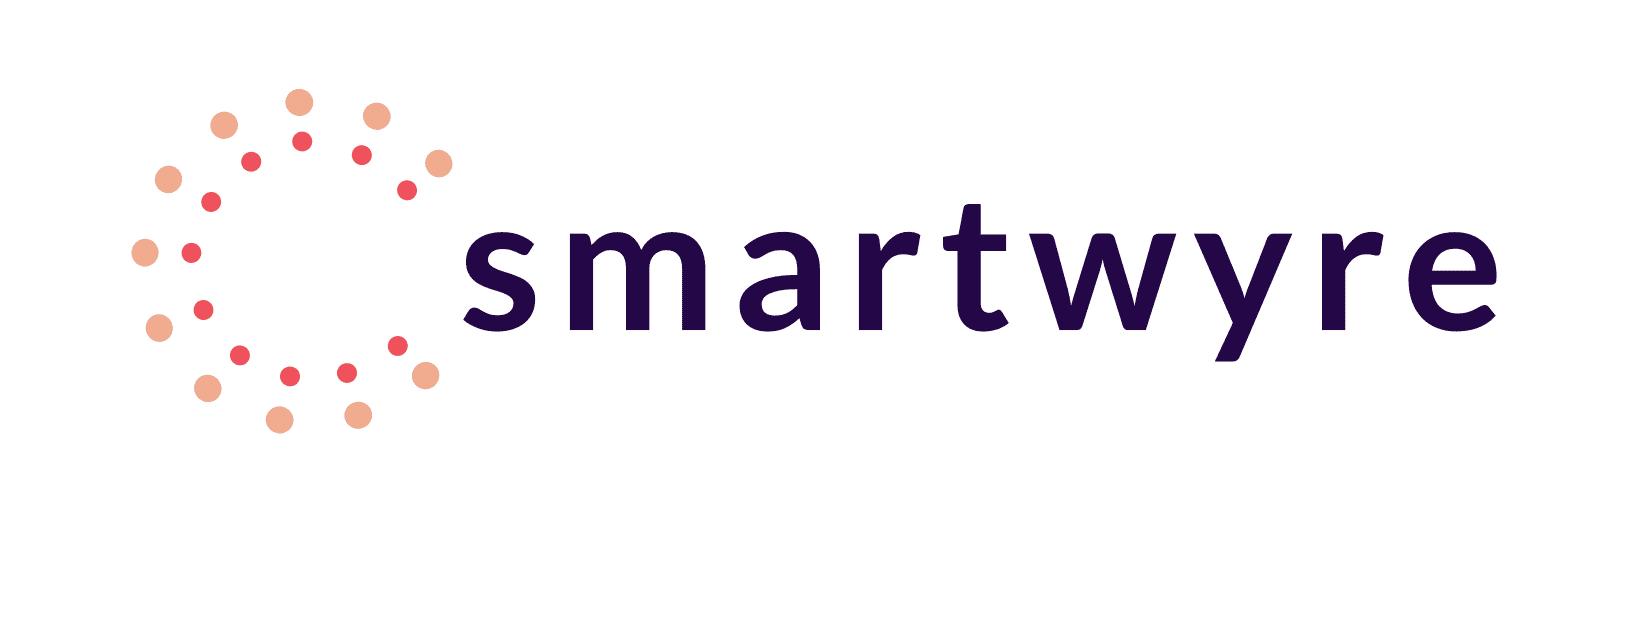 smartwyre web logo (002).png